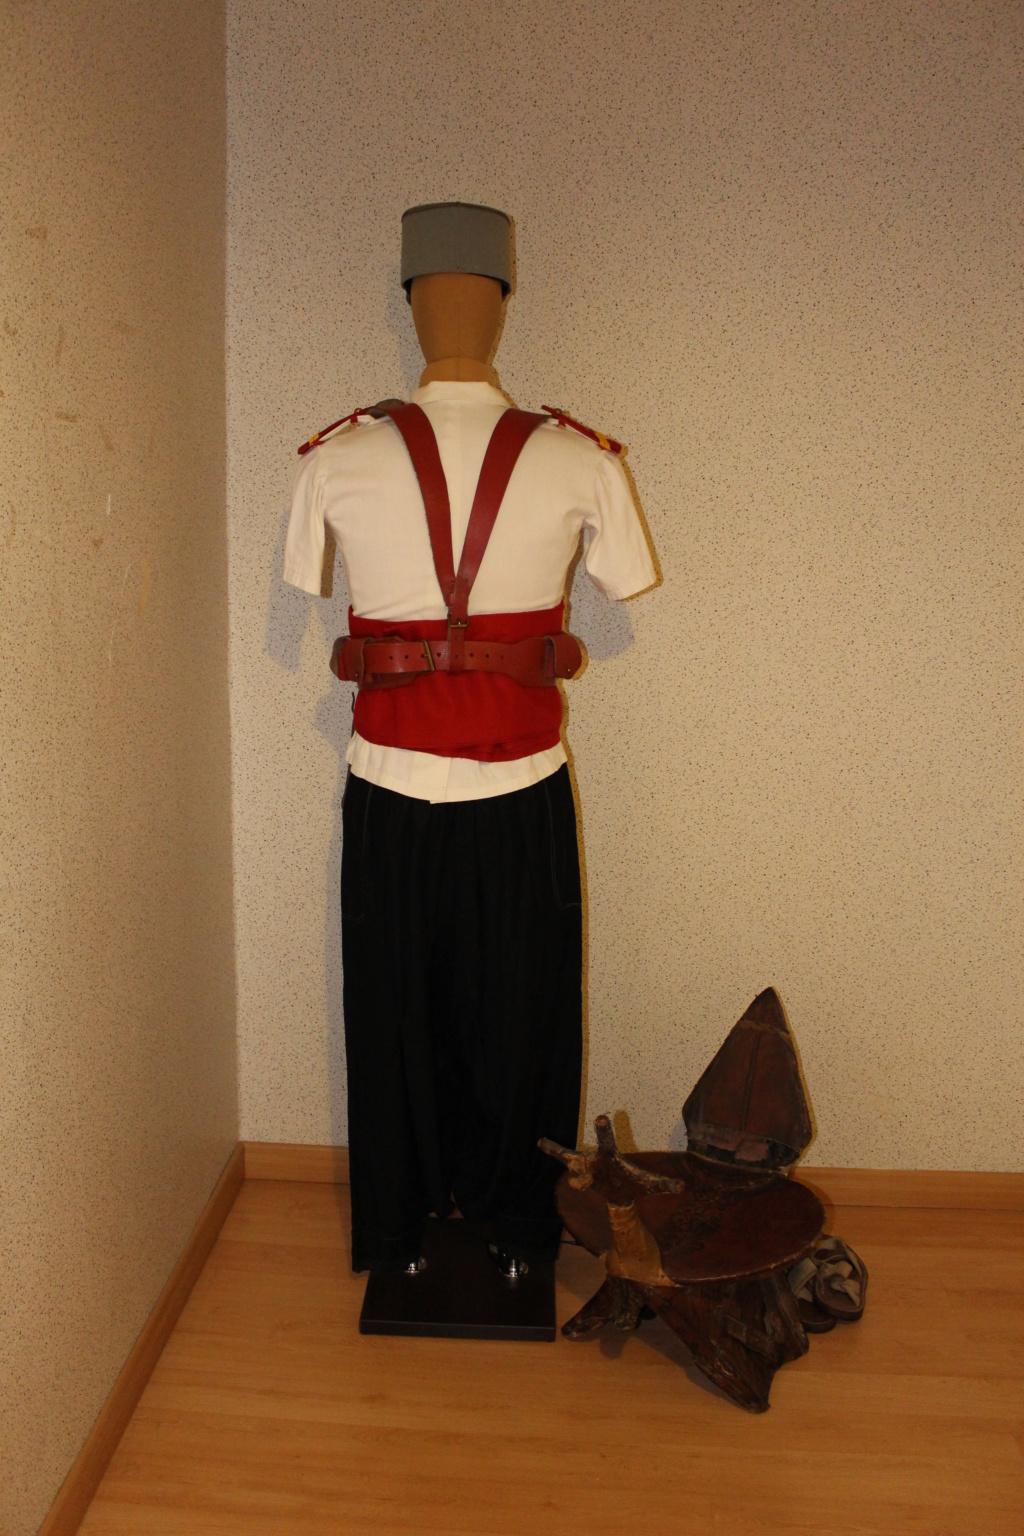 Mannequin méhariste, Compagnies sahariennes Img_2637